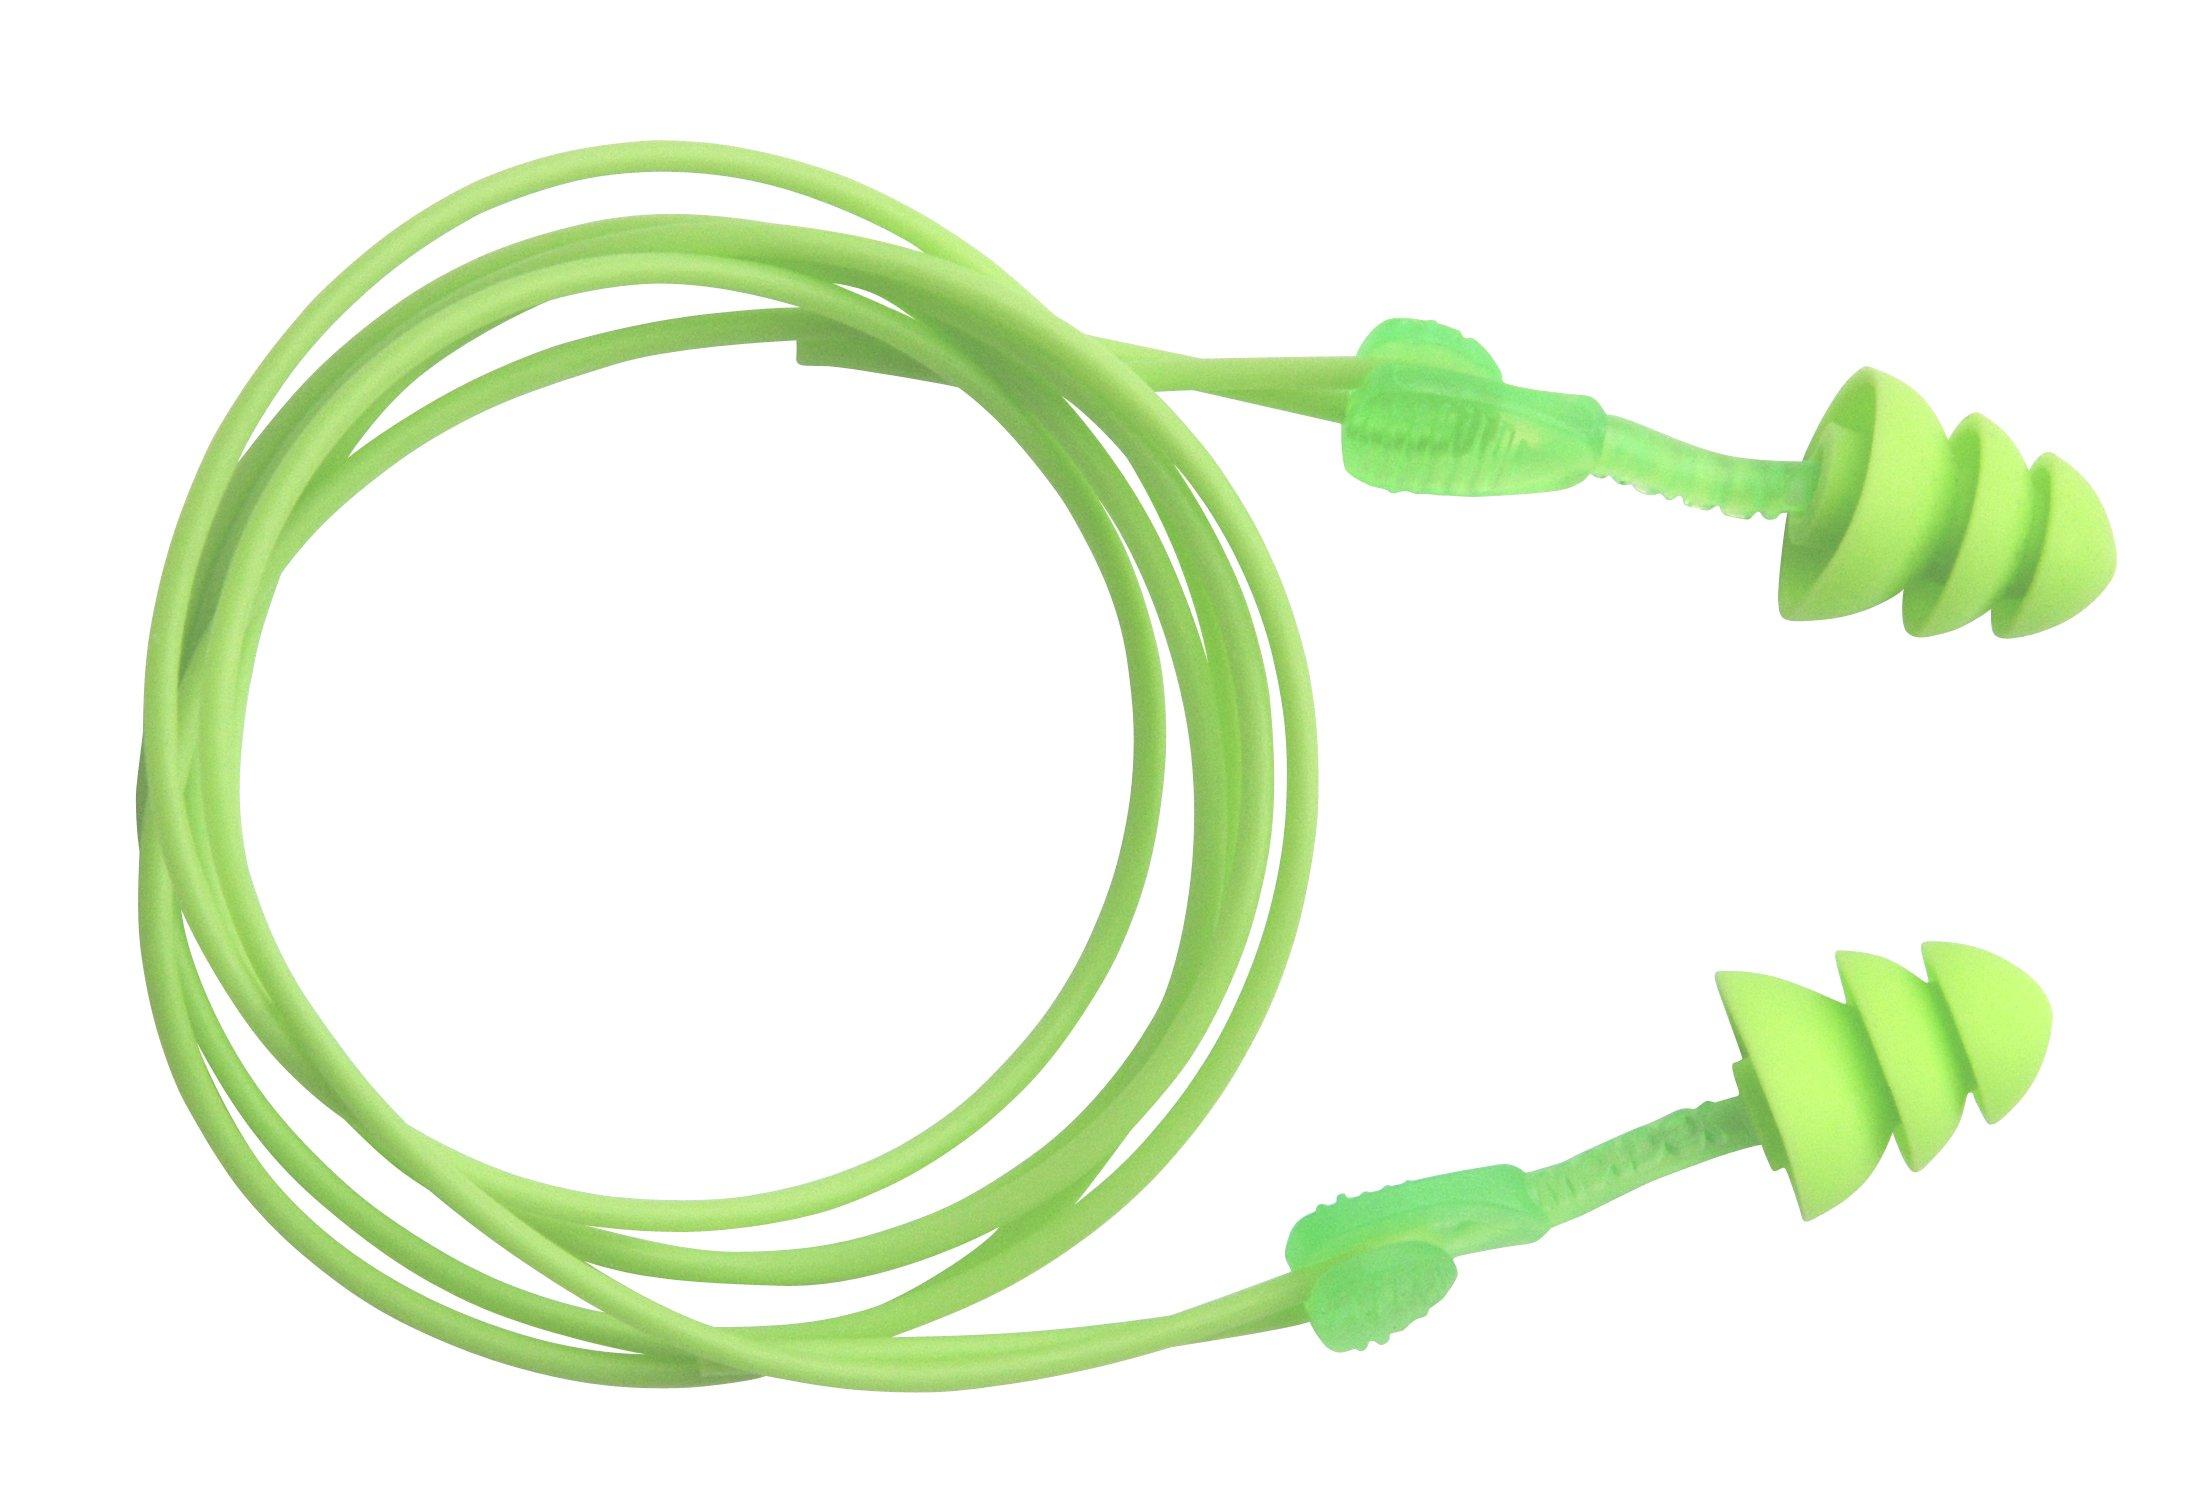 Moldex M6445 Corded Reusable Earplugs, Glide Trio Triple Flange (50 per Dispenser)